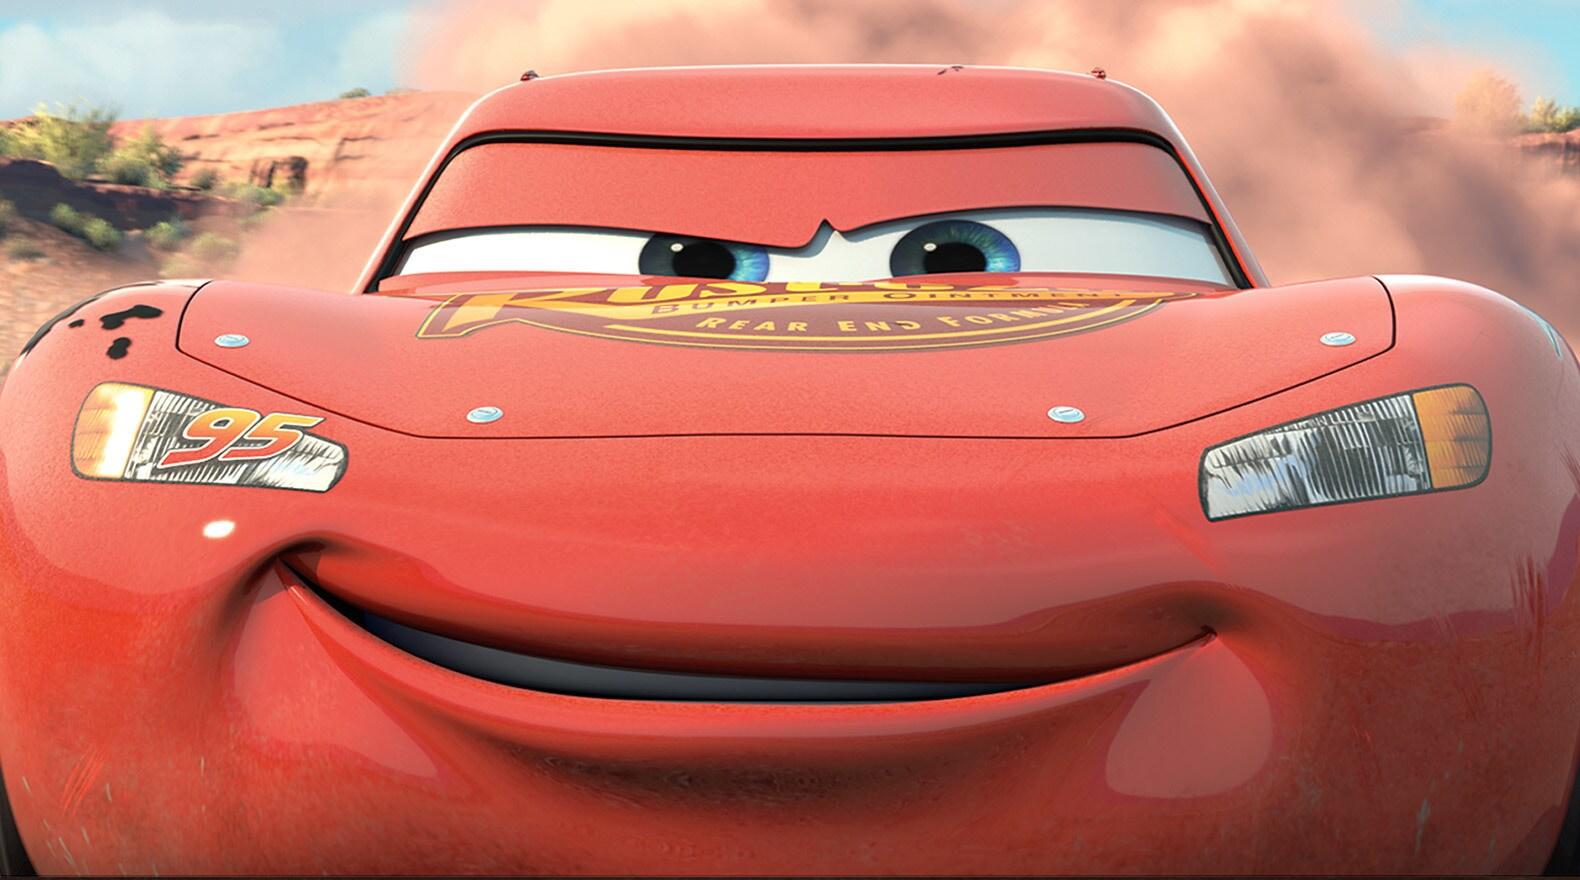 Rust Eze Lightning Mcqueen Cars